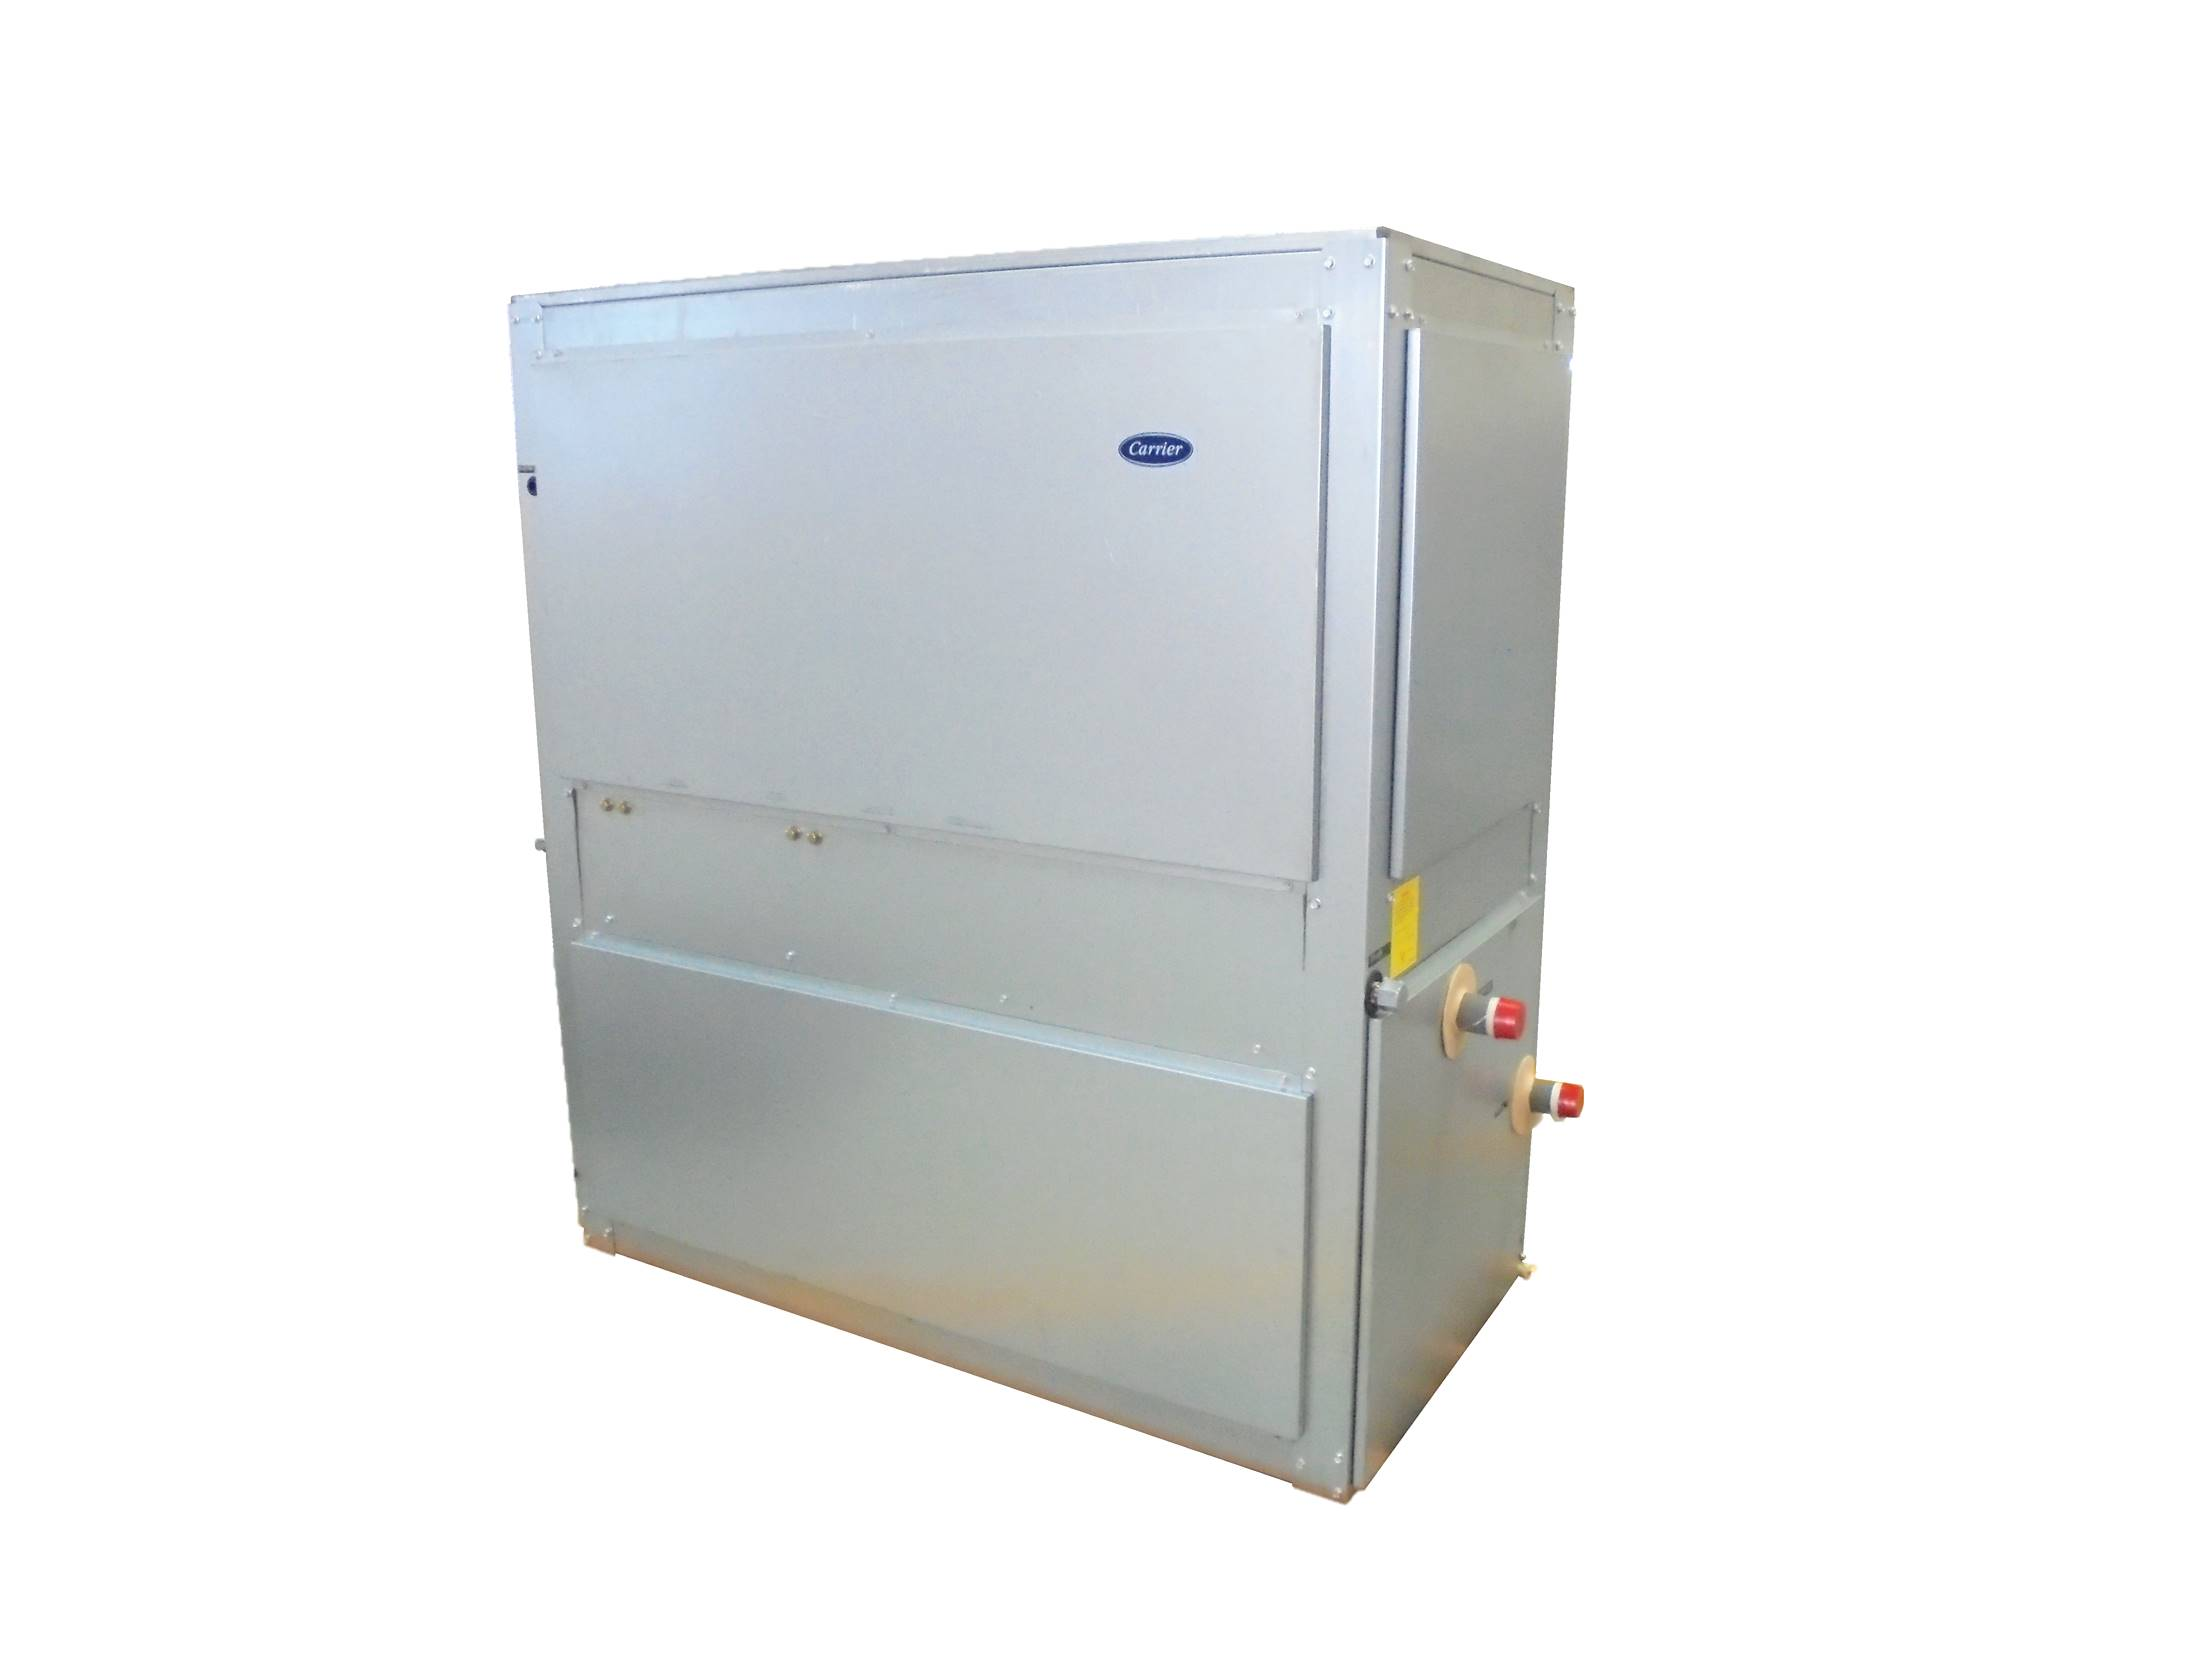 carrier-40lm150-fan-coil